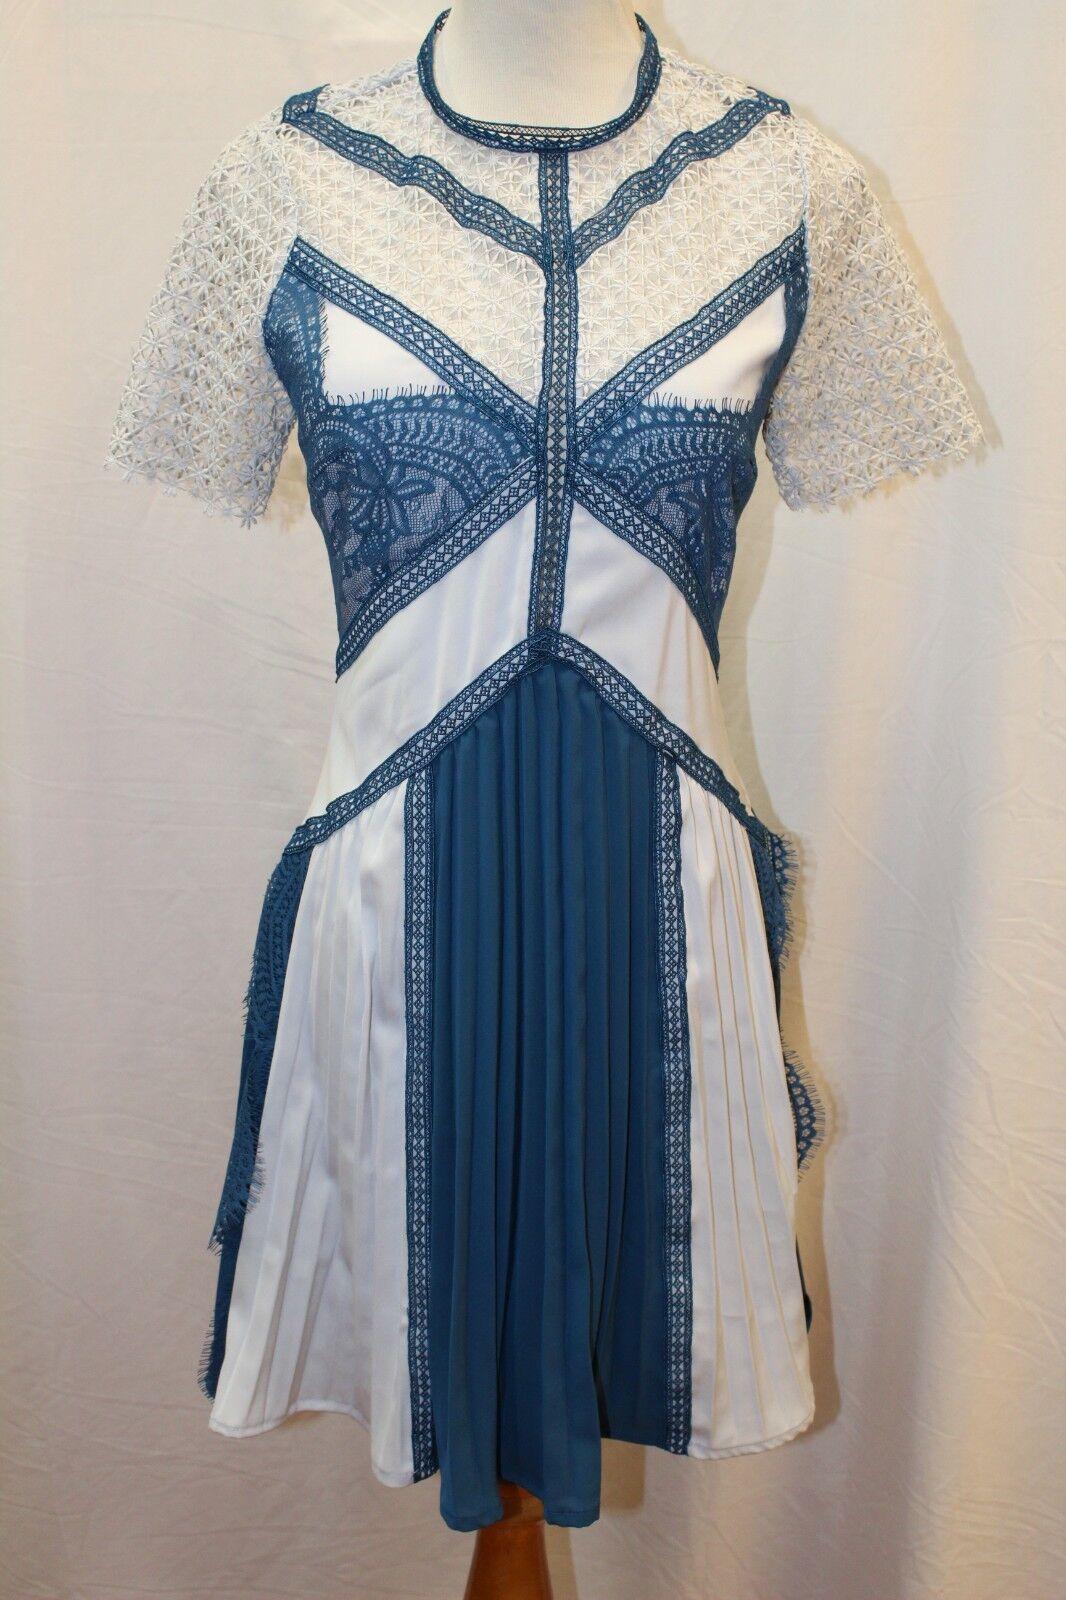 NEW Self-Portrait Lace Panel Mini bluee bluee bluee Short Sleeve Dress US 4 S Small 814008